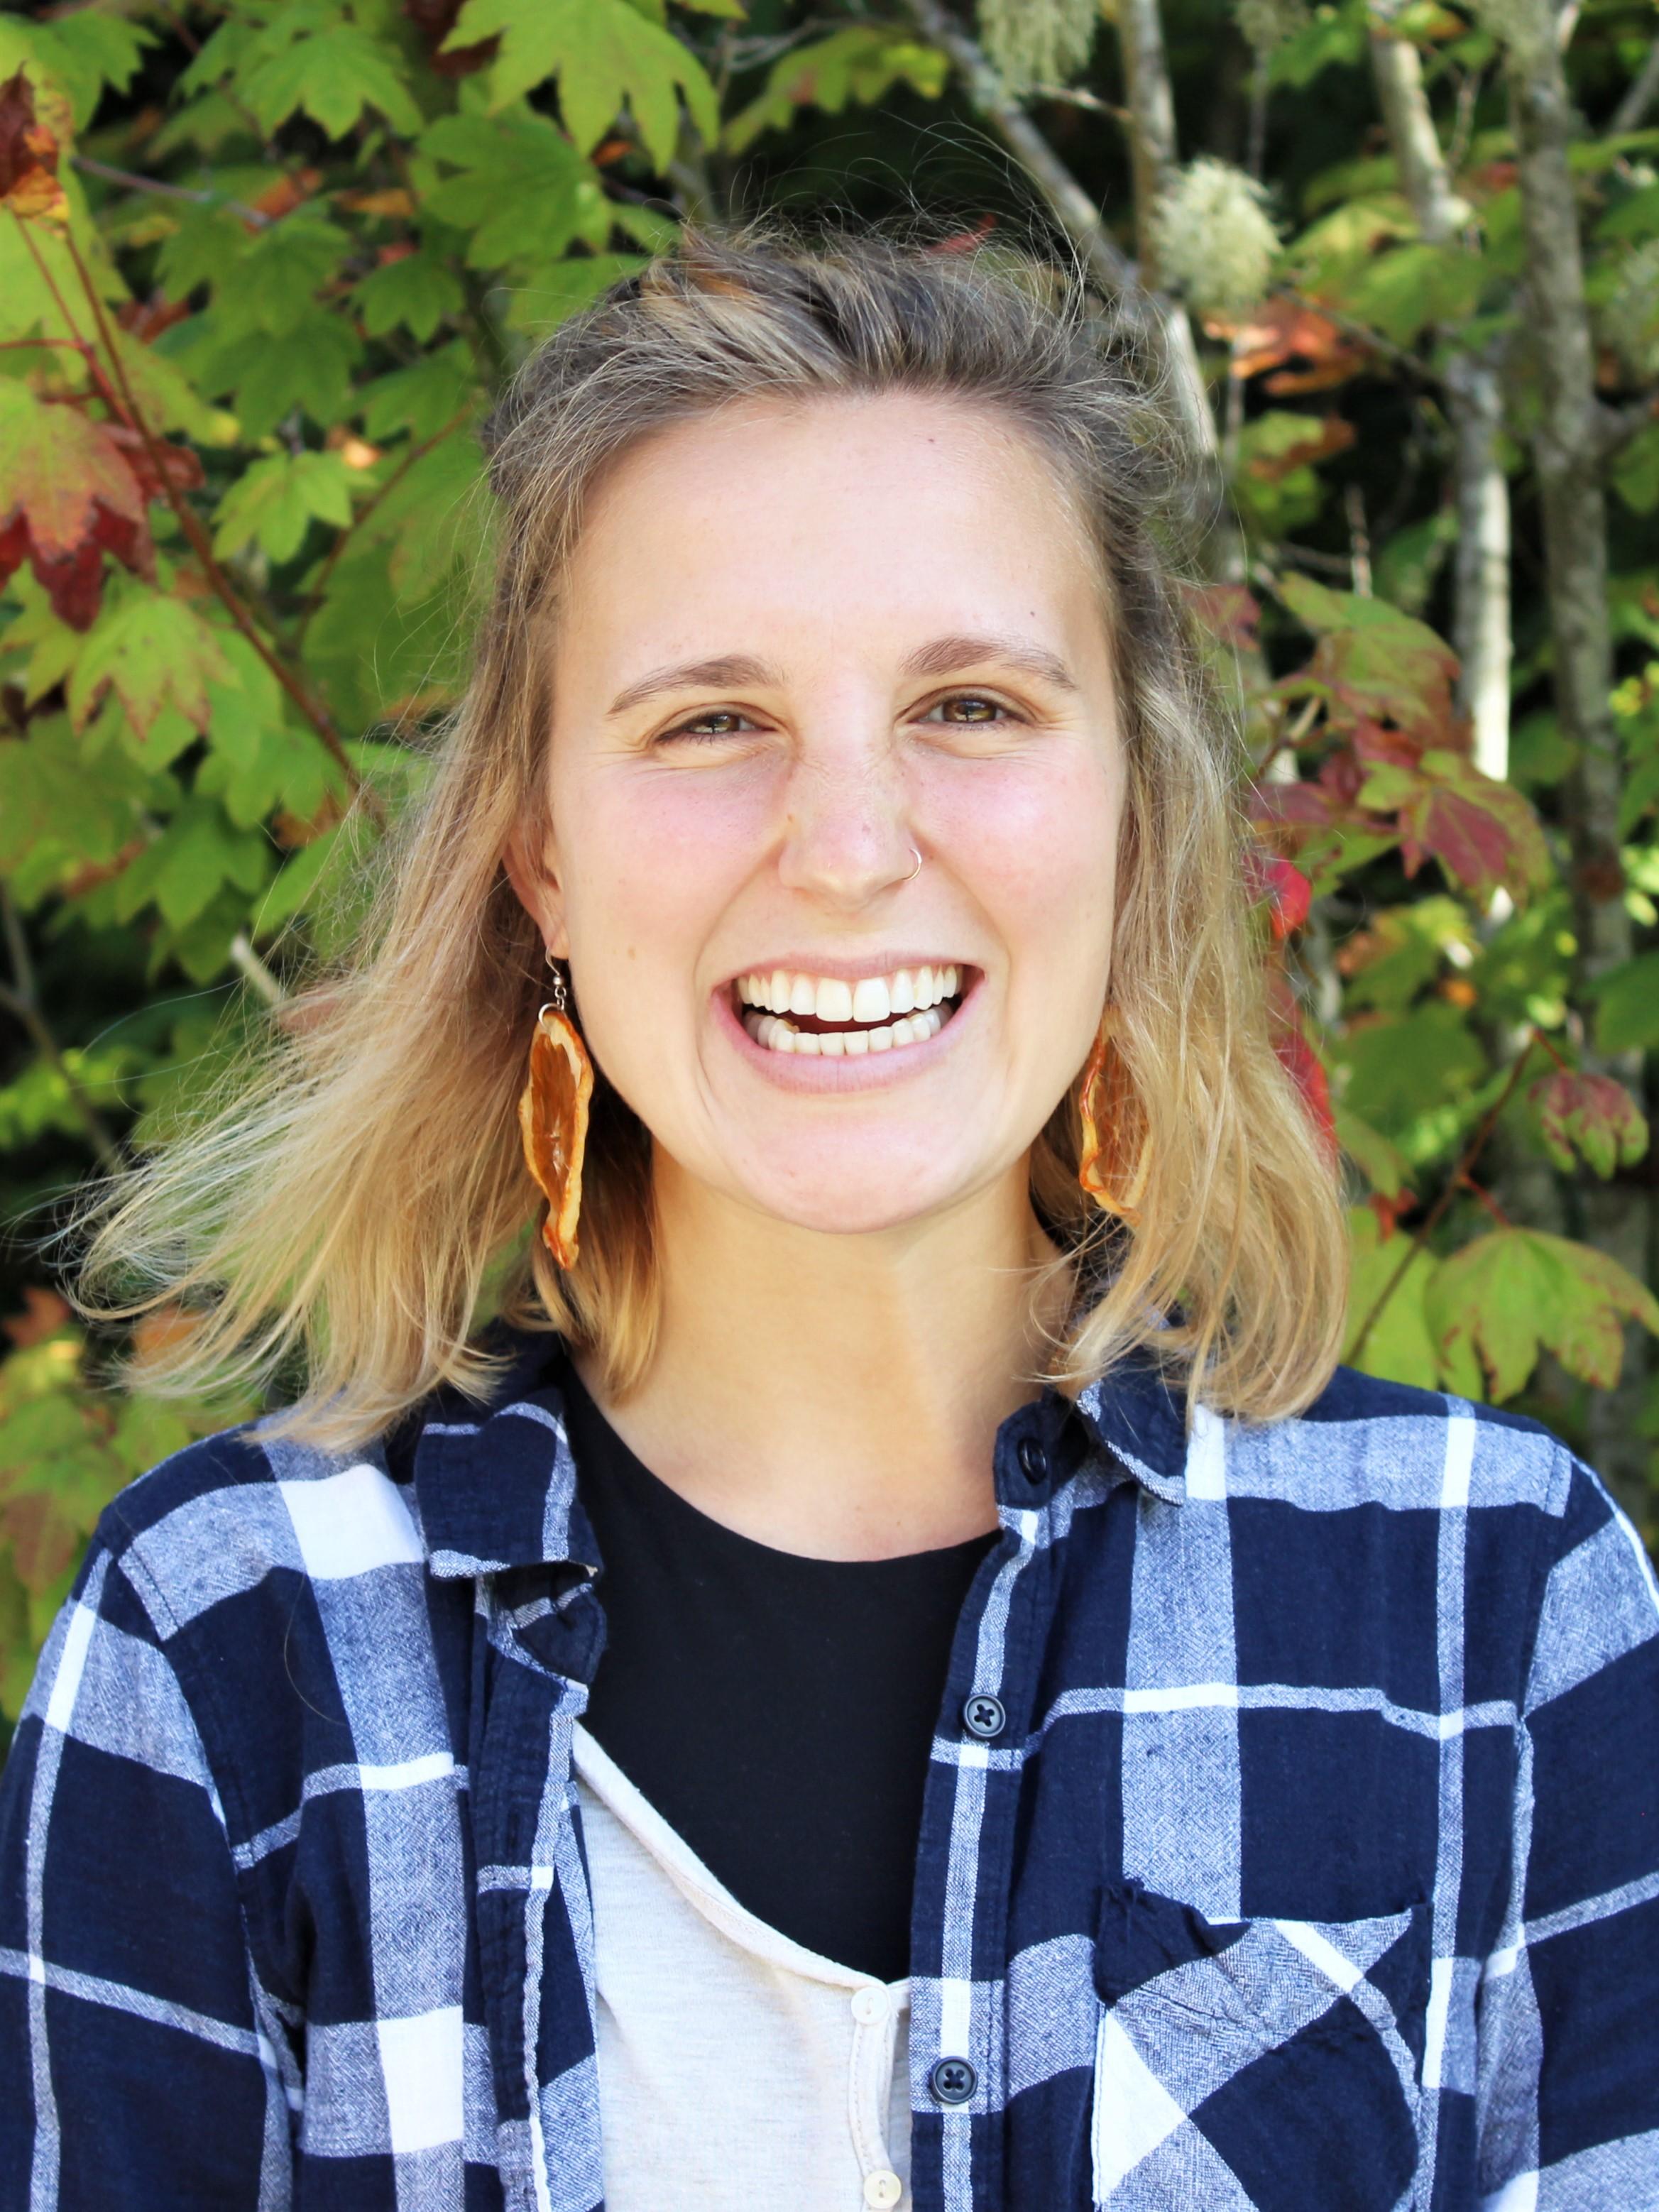 IslandWood Graduate Program student Grace Werner